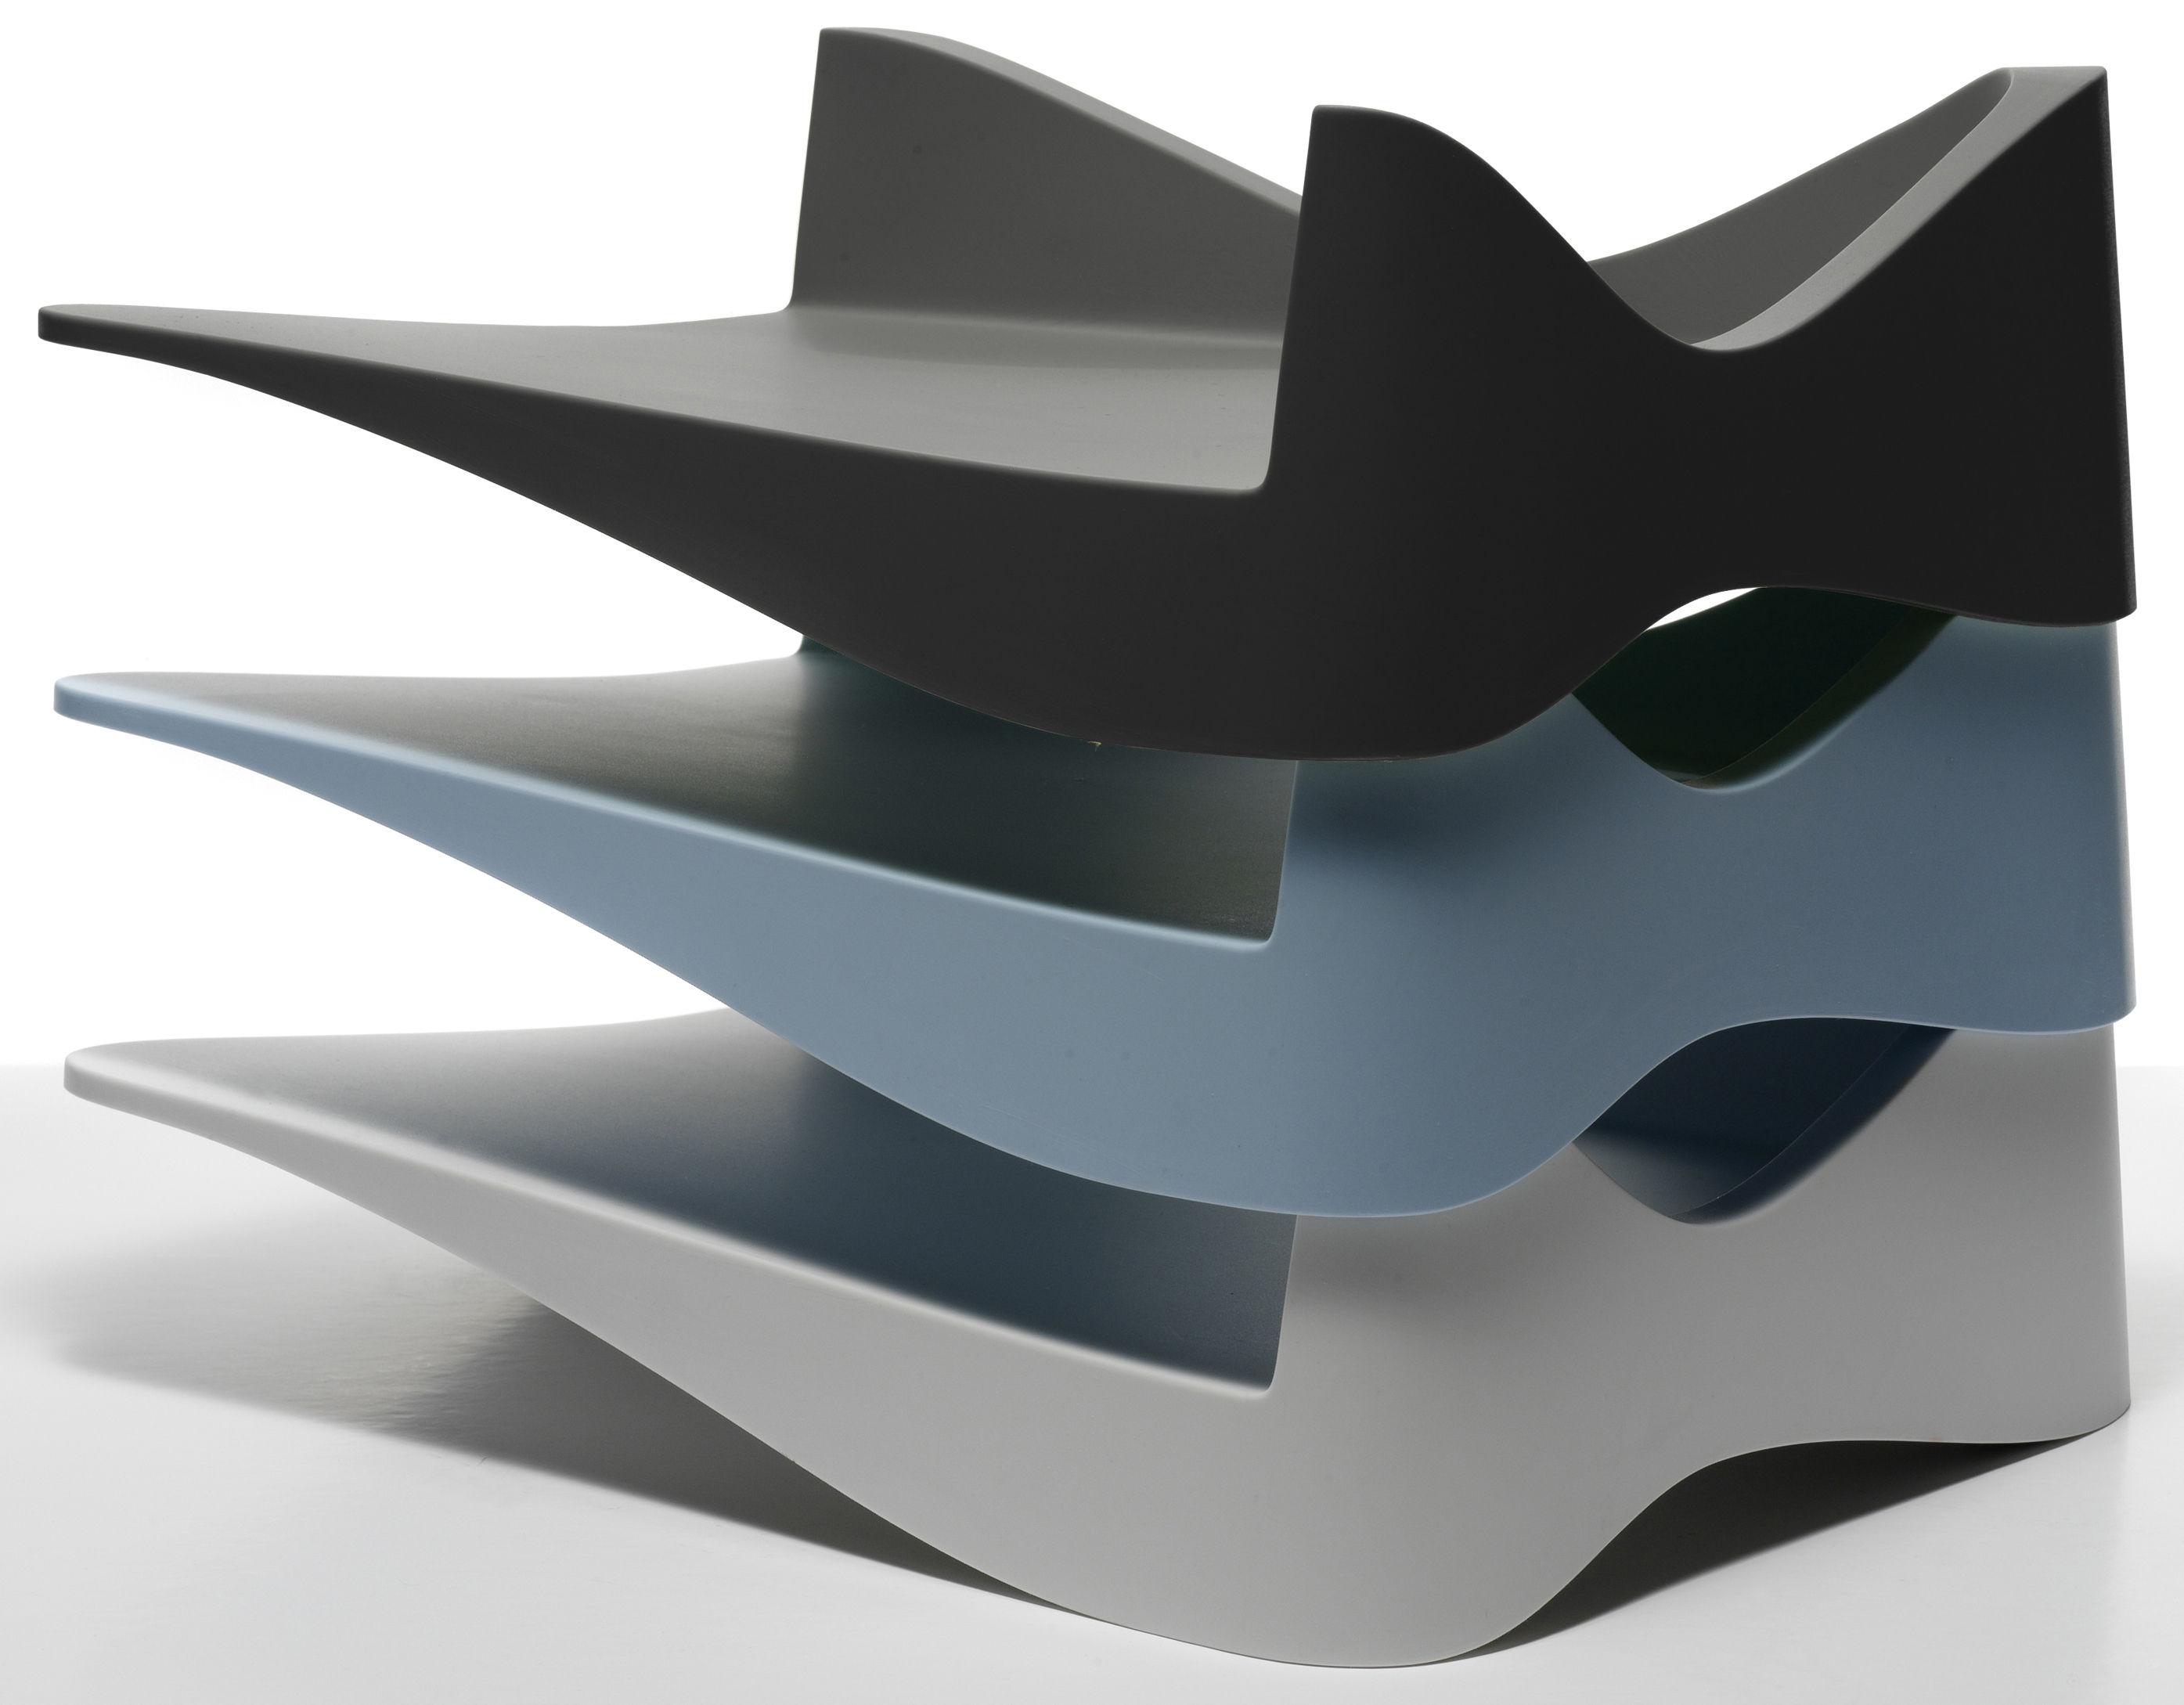 corbeille courrier parq noir alessi. Black Bedroom Furniture Sets. Home Design Ideas